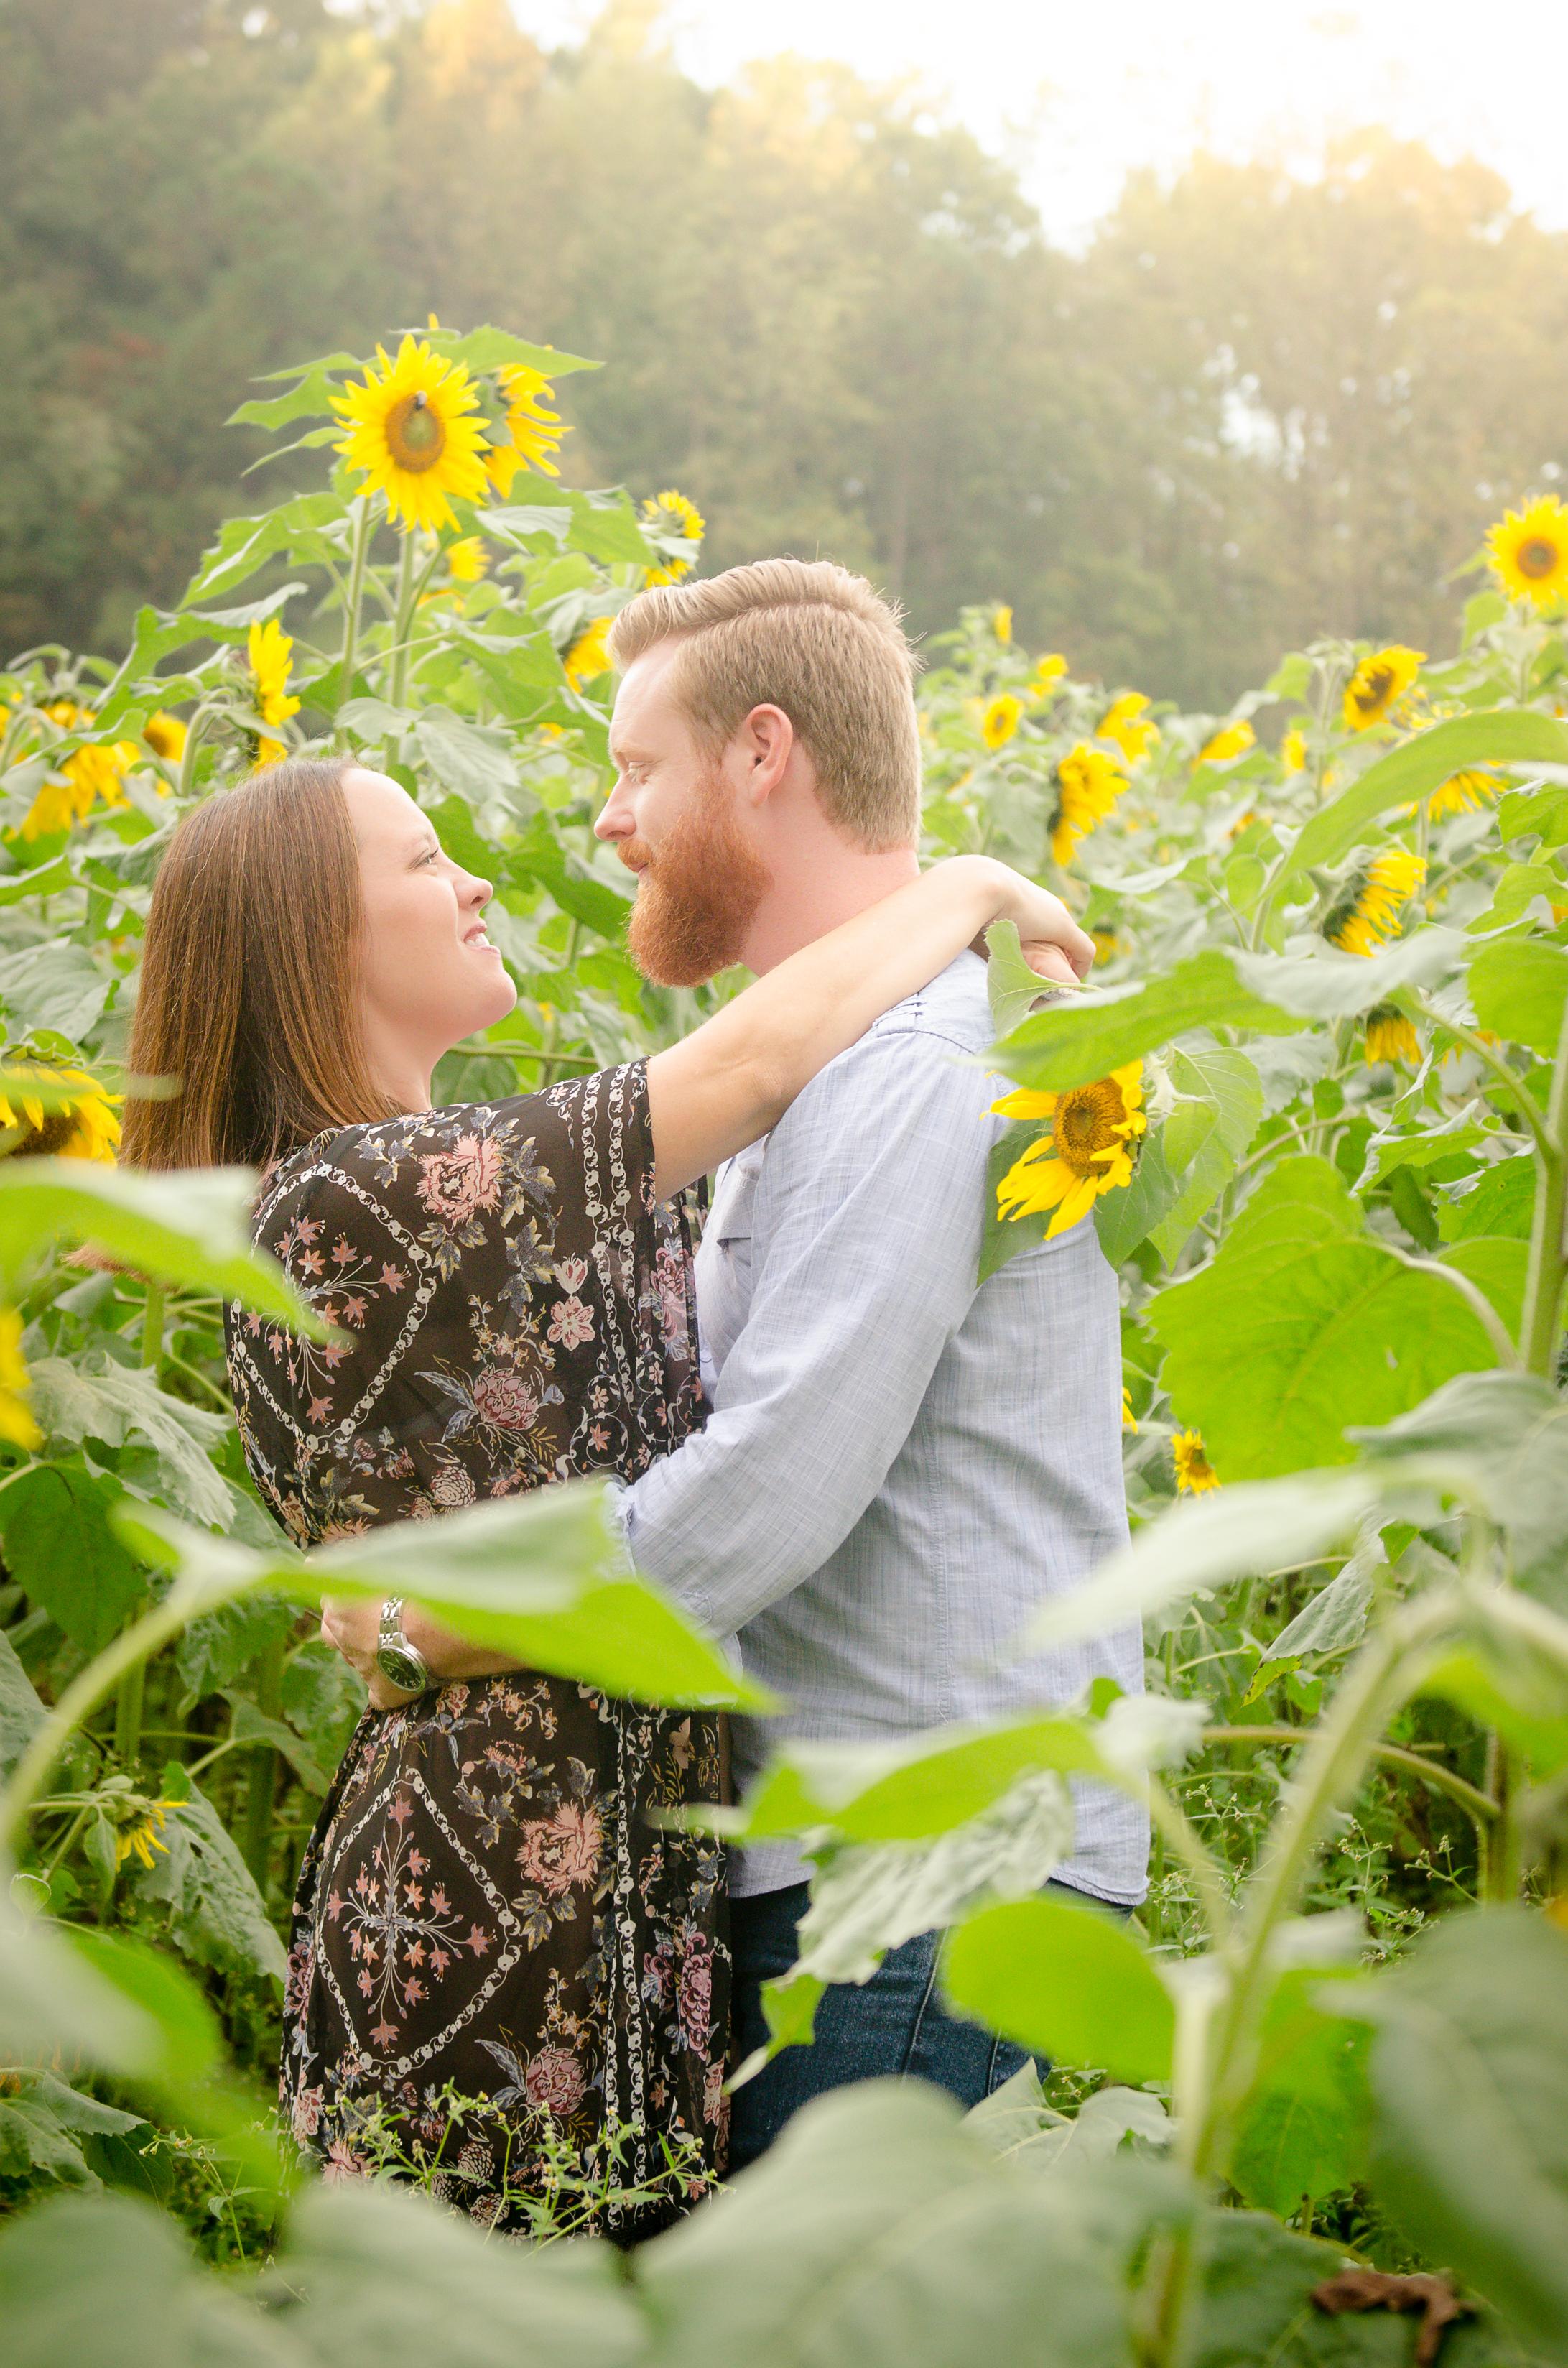 Lawleys_Sunflowers-3.jpg